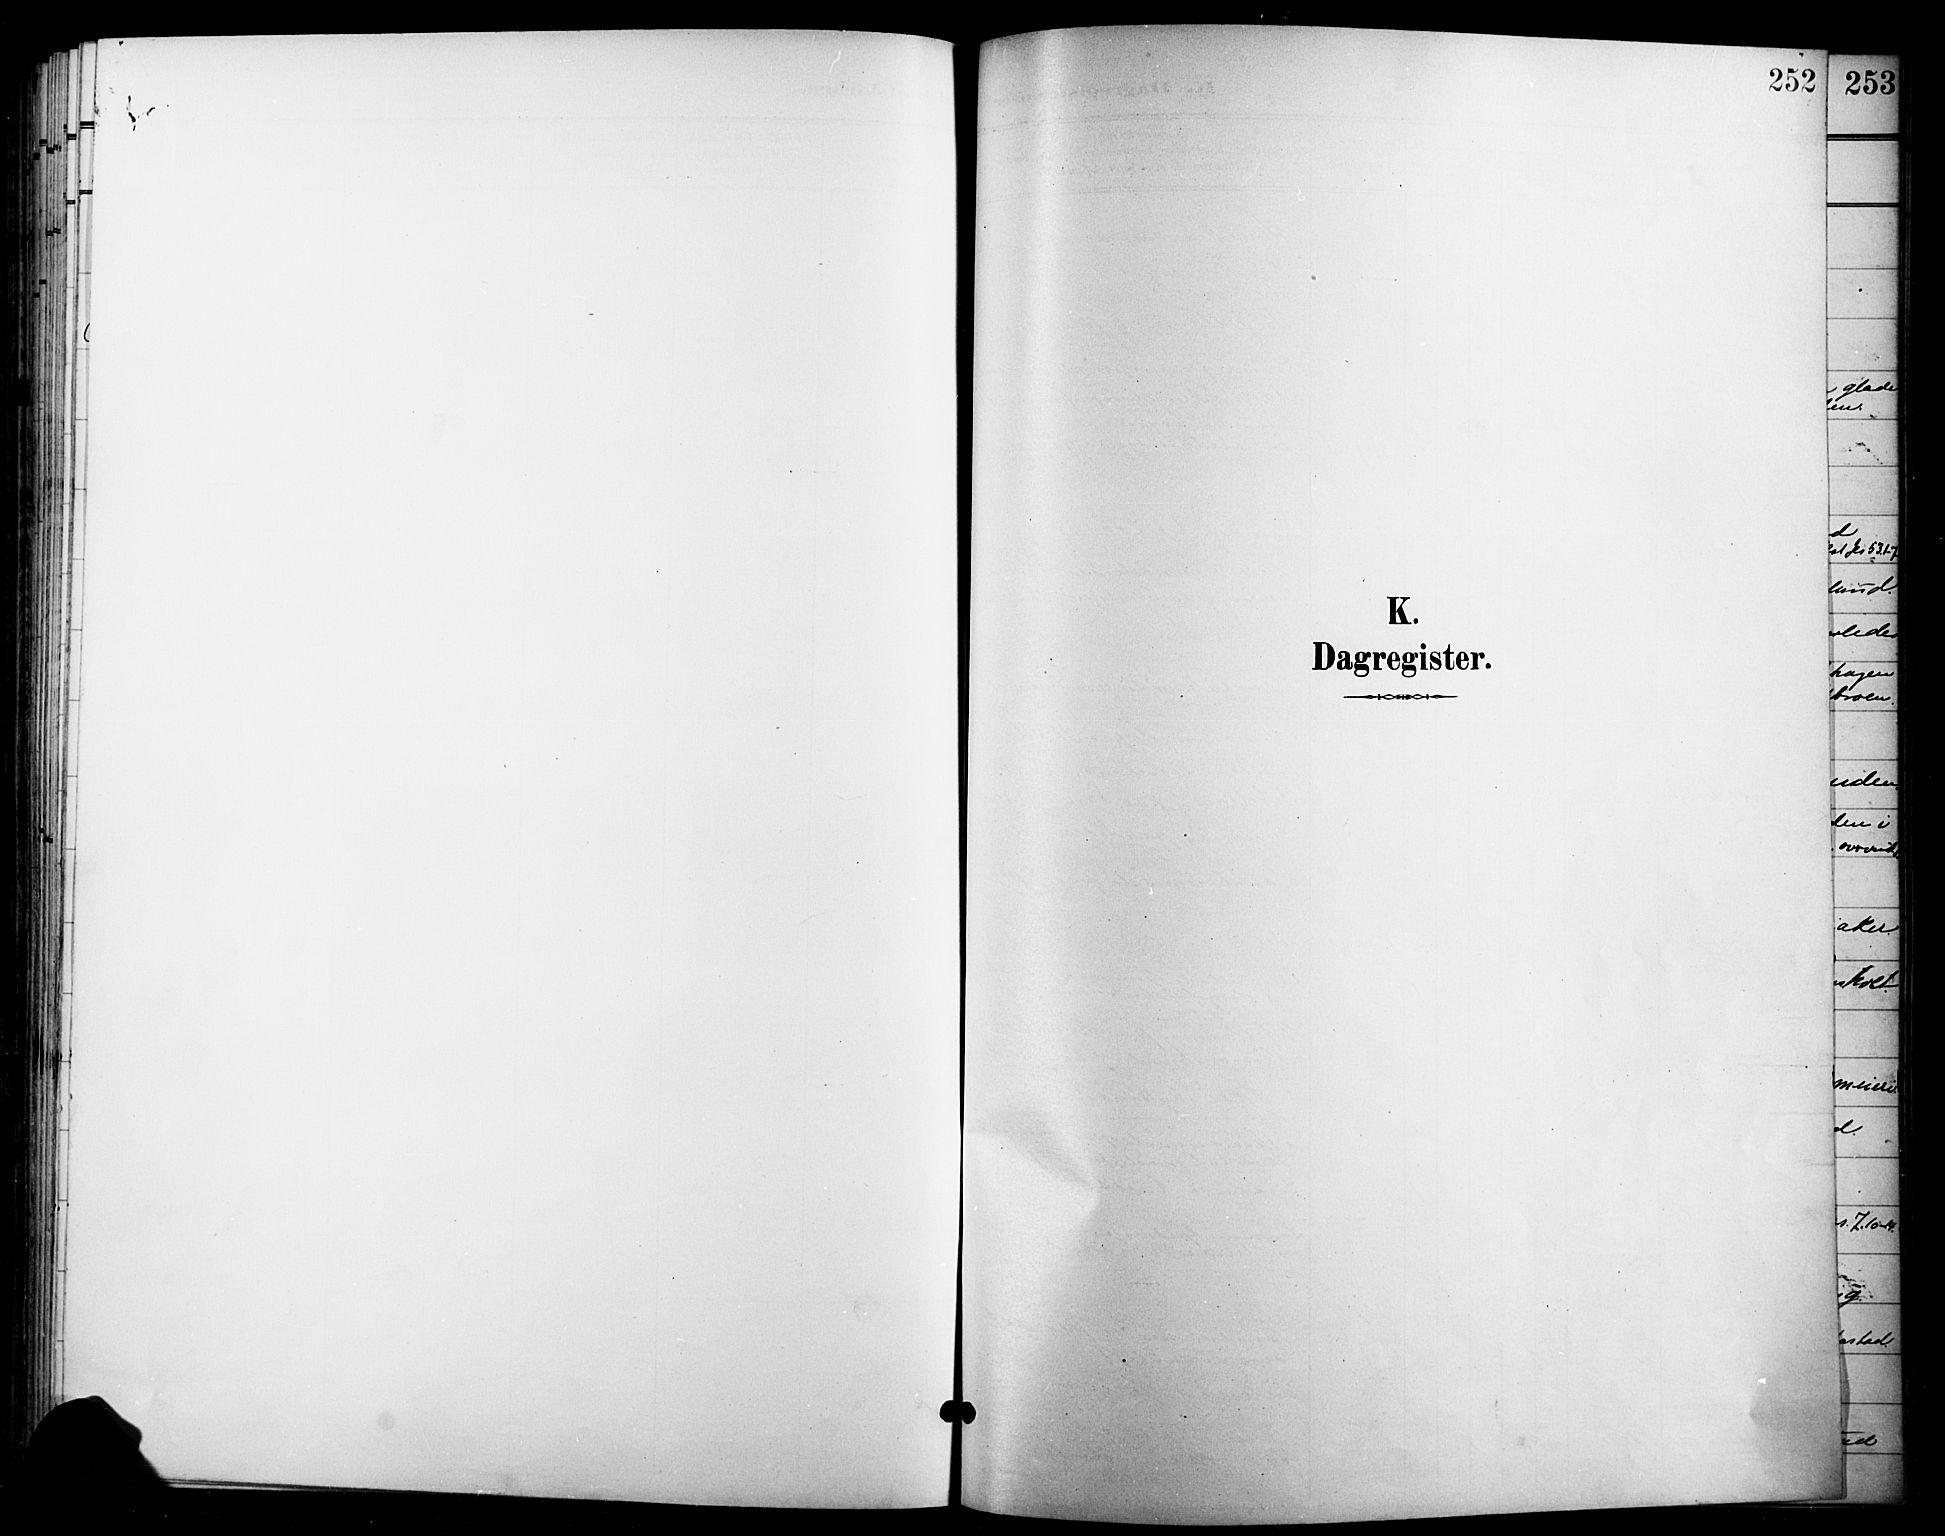 SAH, Gran prestekontor, Ministerialbok nr. 19, 1898-1907, s. 252